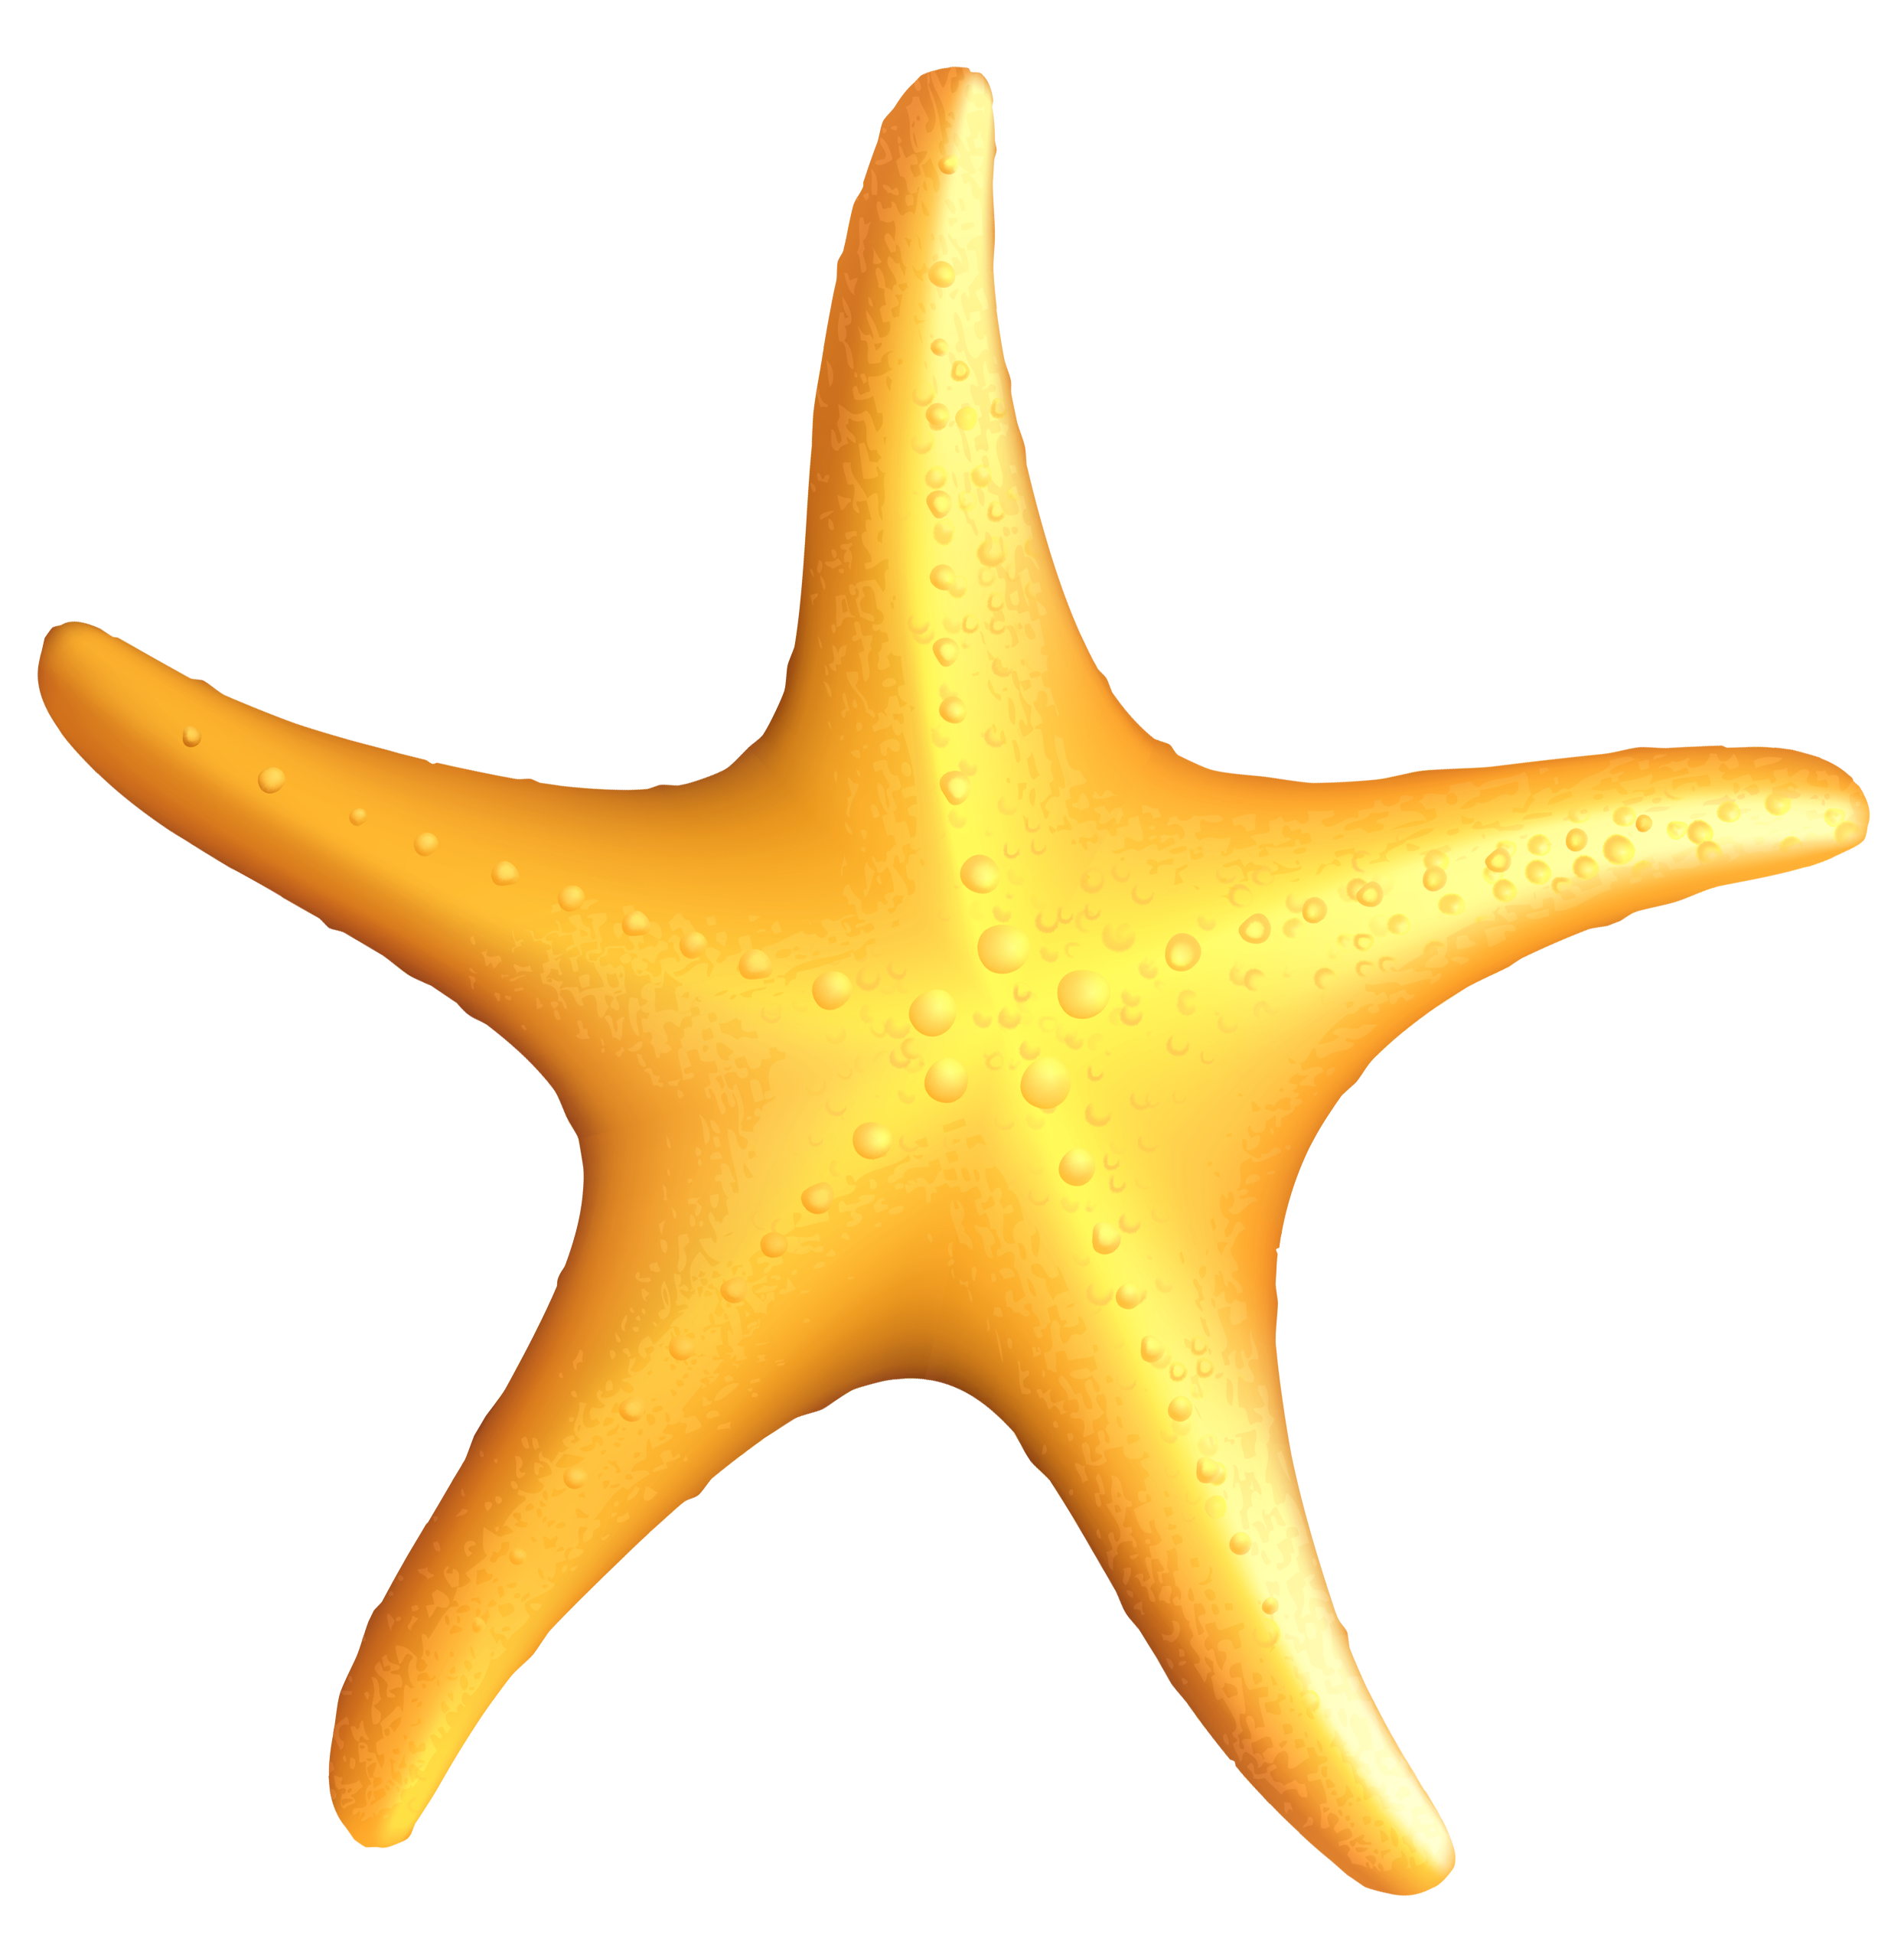 2488x2558 Transparent Beach Starfish Png Clipartu200b Gallery Yopriceville